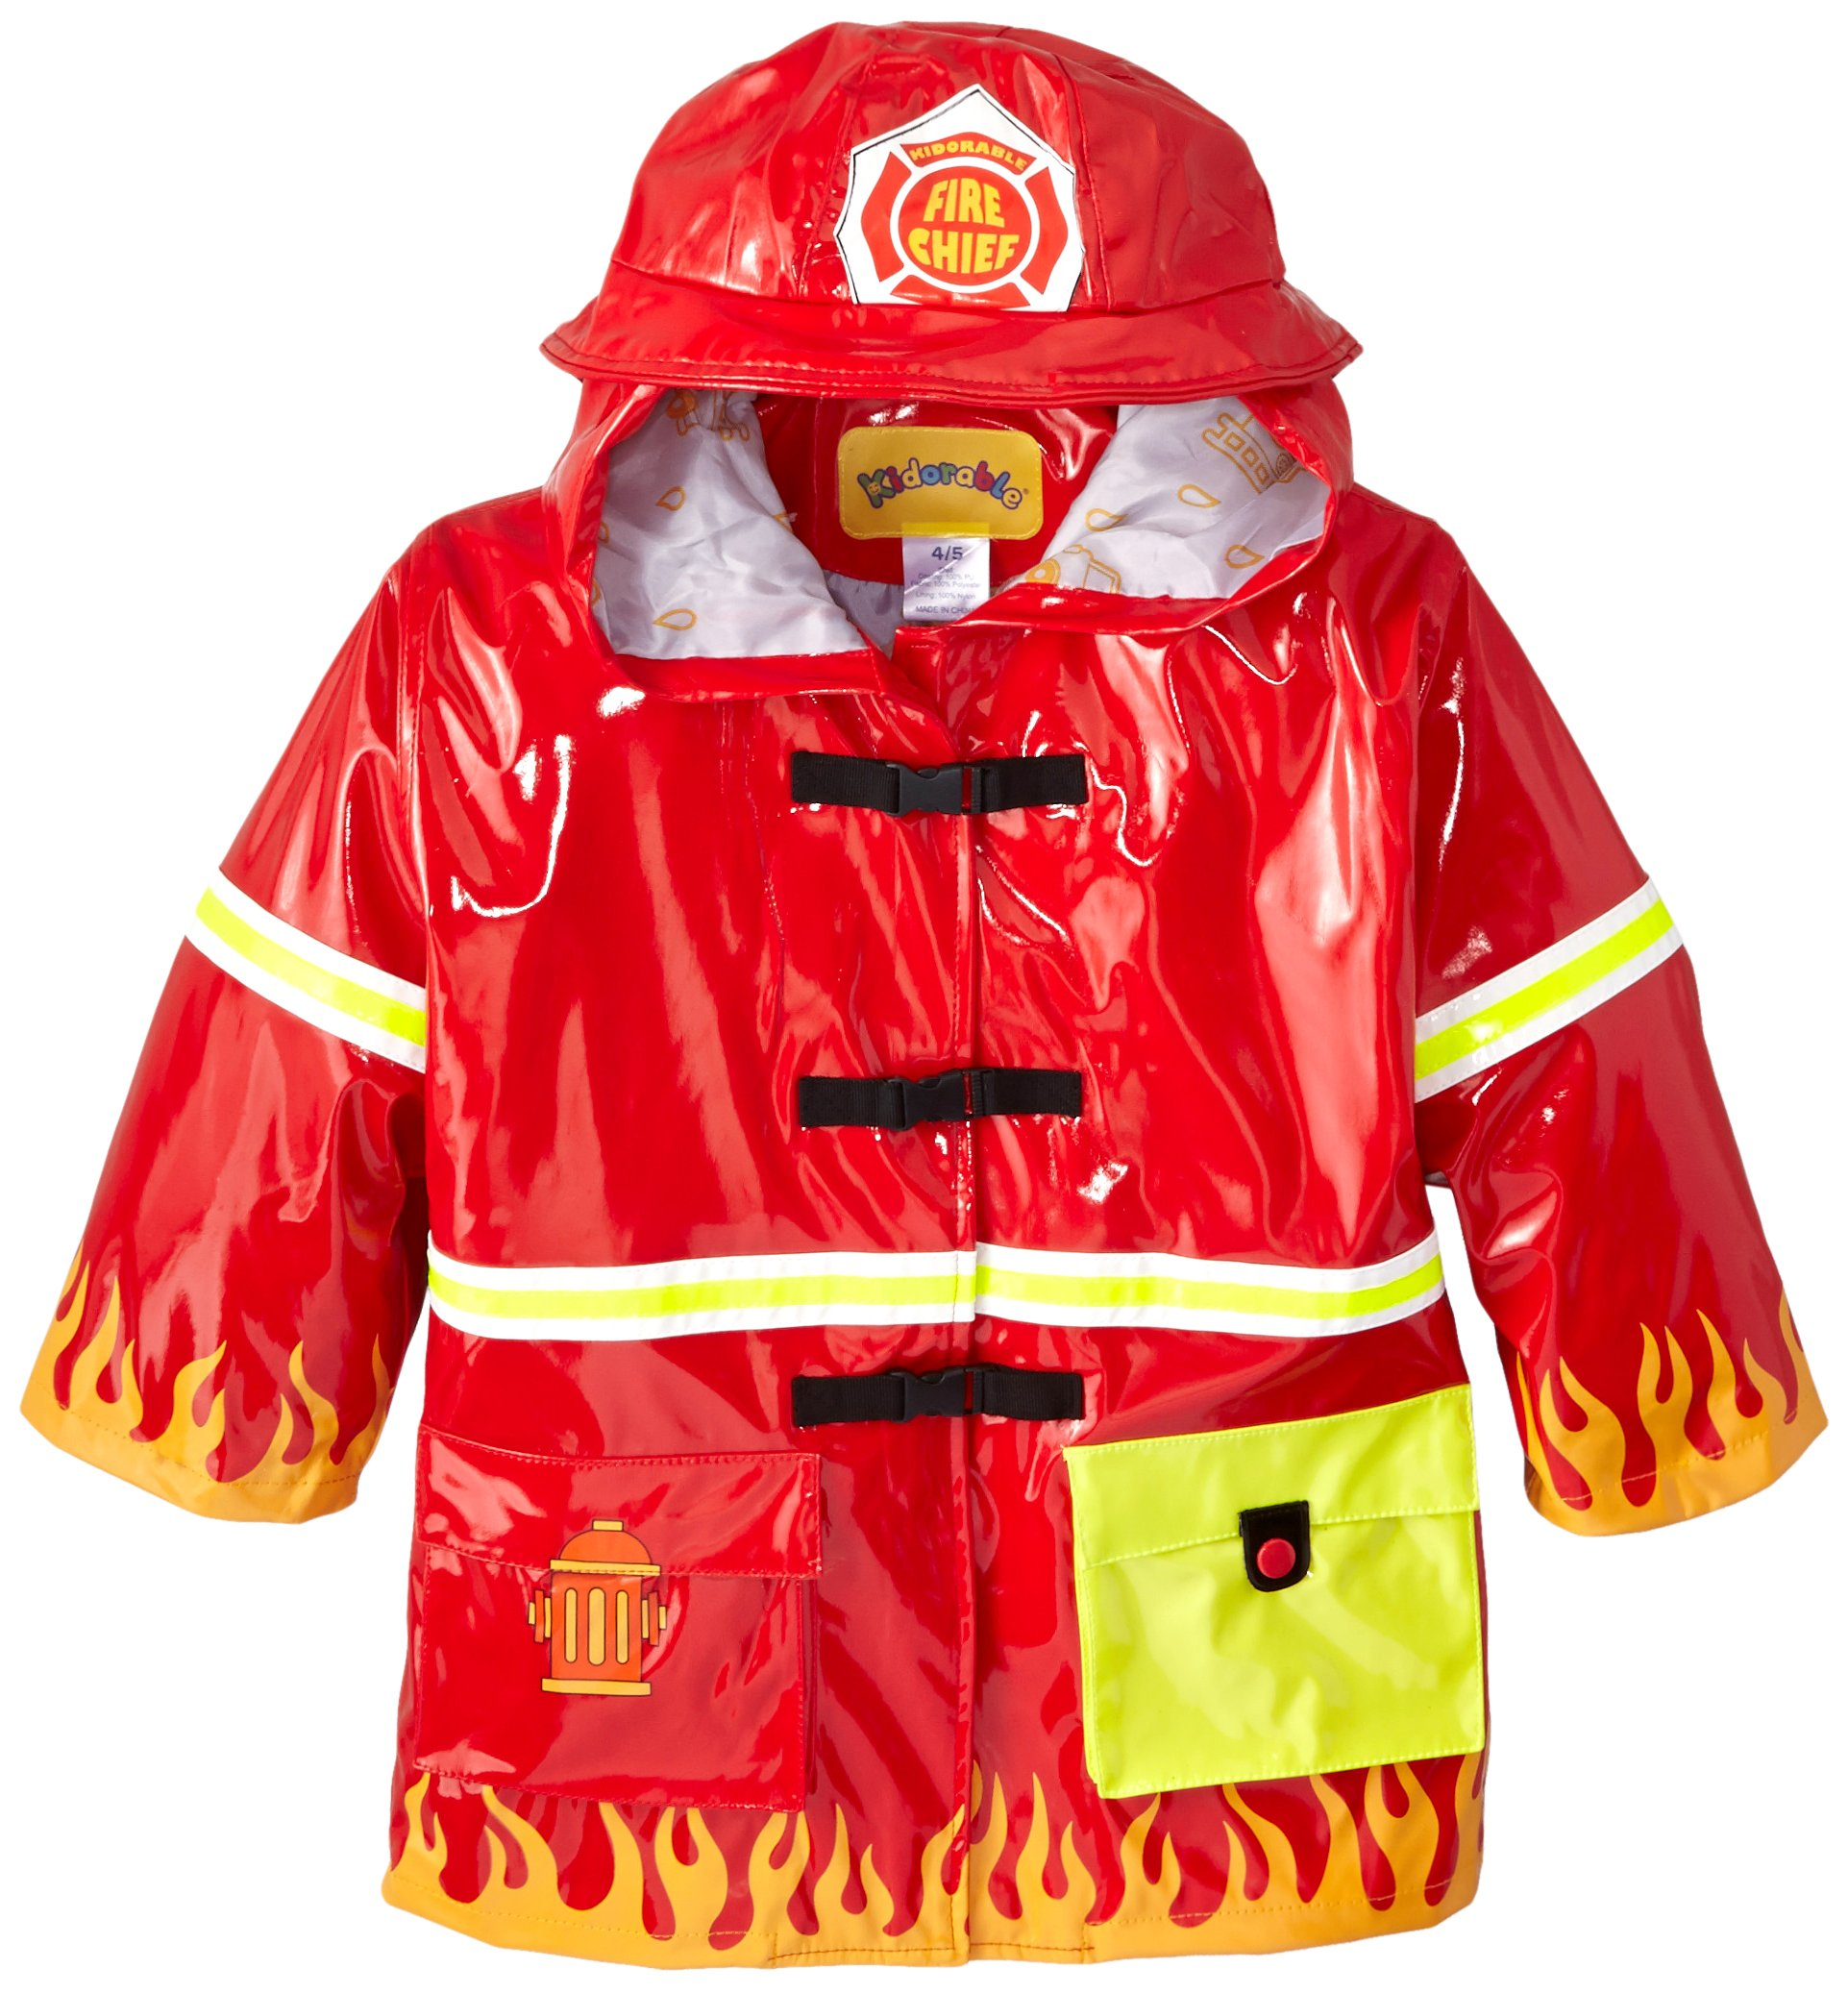 Kidorable Boys' Little Fireman All Weather Waterproof Coat, Red, (6/7) by Kidorable